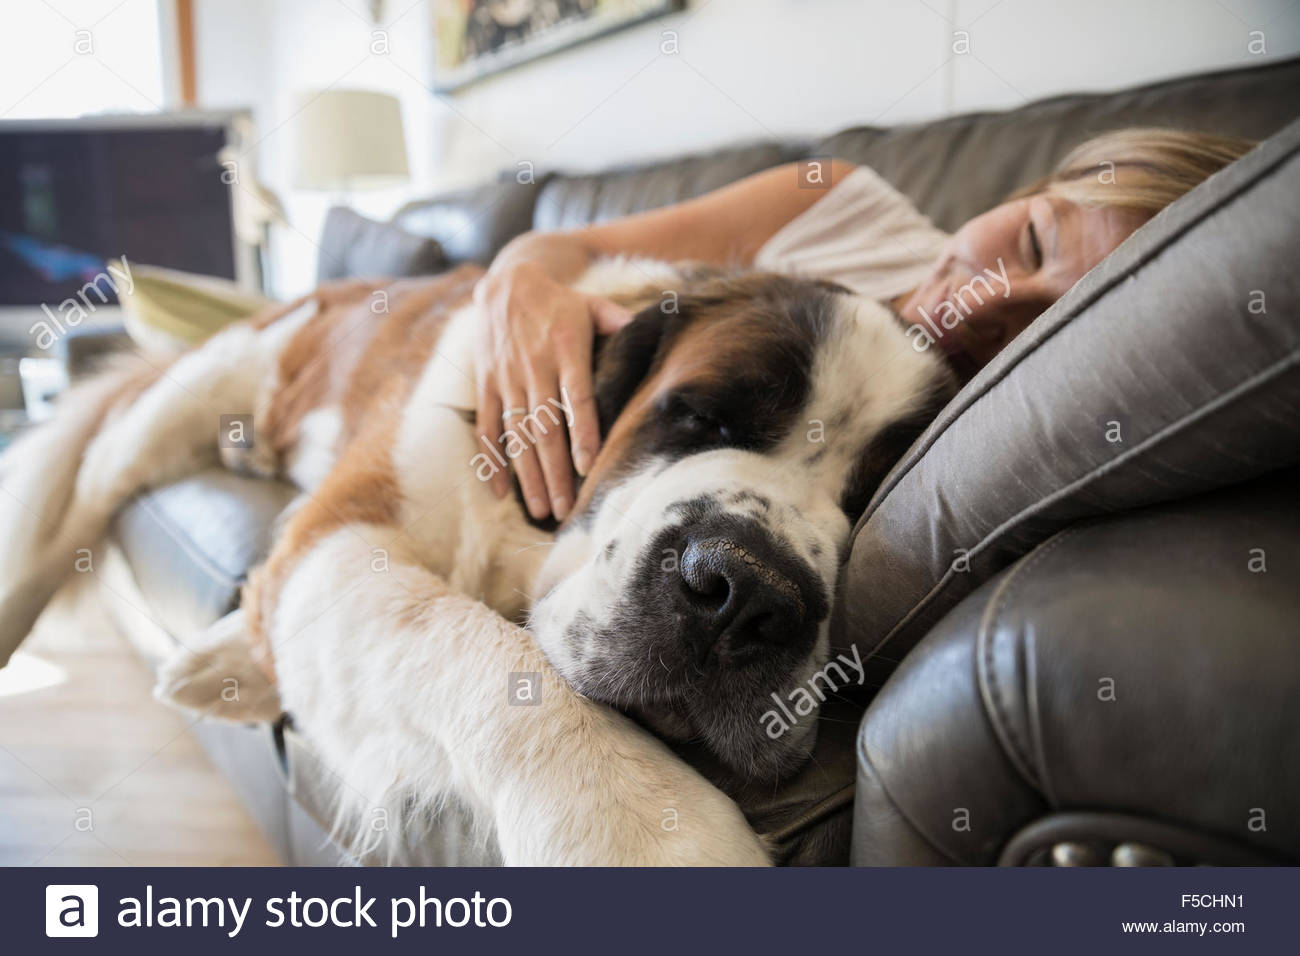 Woman And Saint Bernard Dog Laying On Sofa Stock Photo